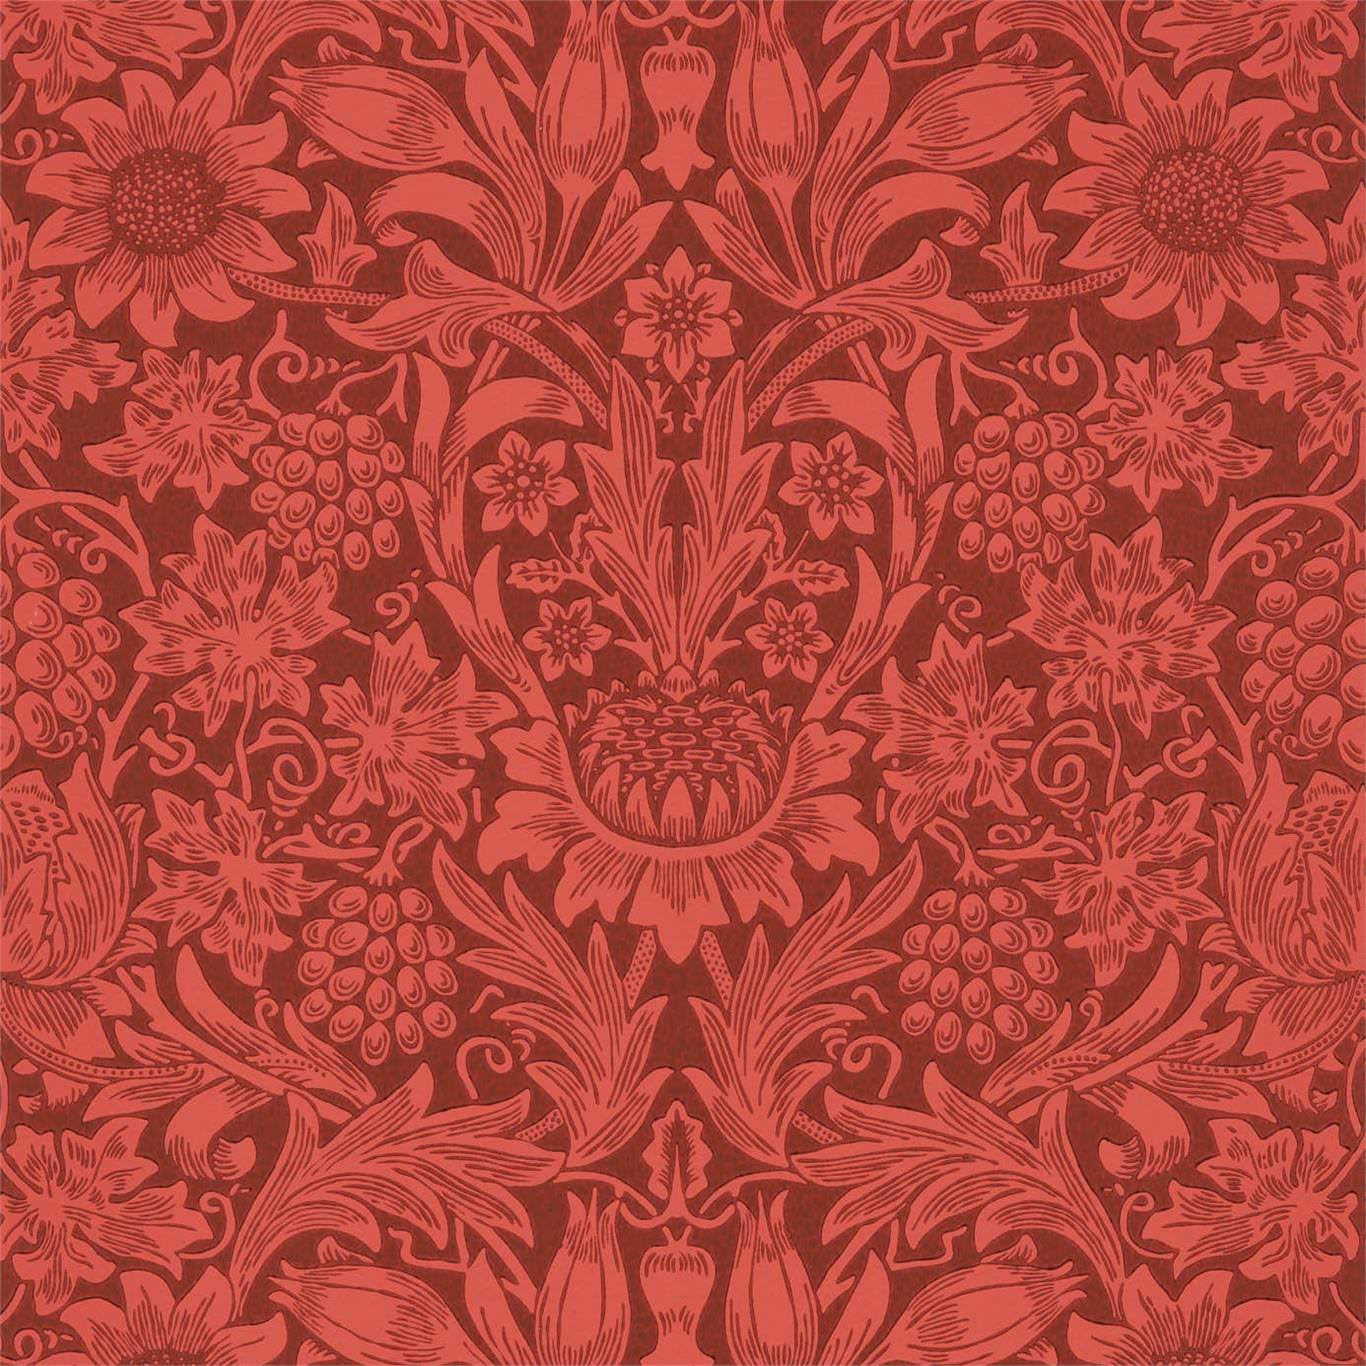 William Morris & Co Tapet Sunflower Chocolate red